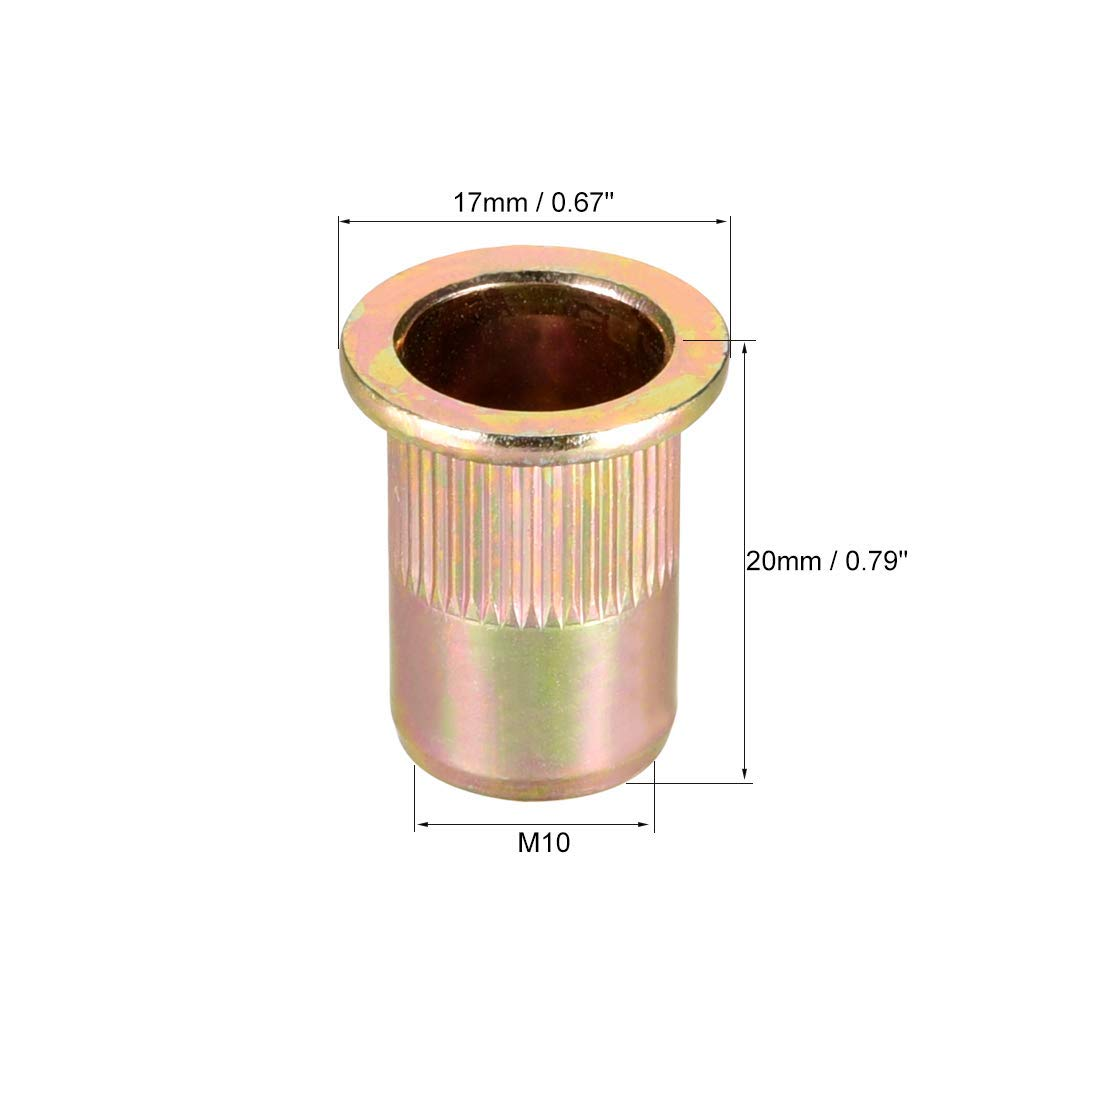 M10 Carbon Steel Rivet Nuts Flat Head Insert Nutsert Yellow zinc Plated 50 Pieces